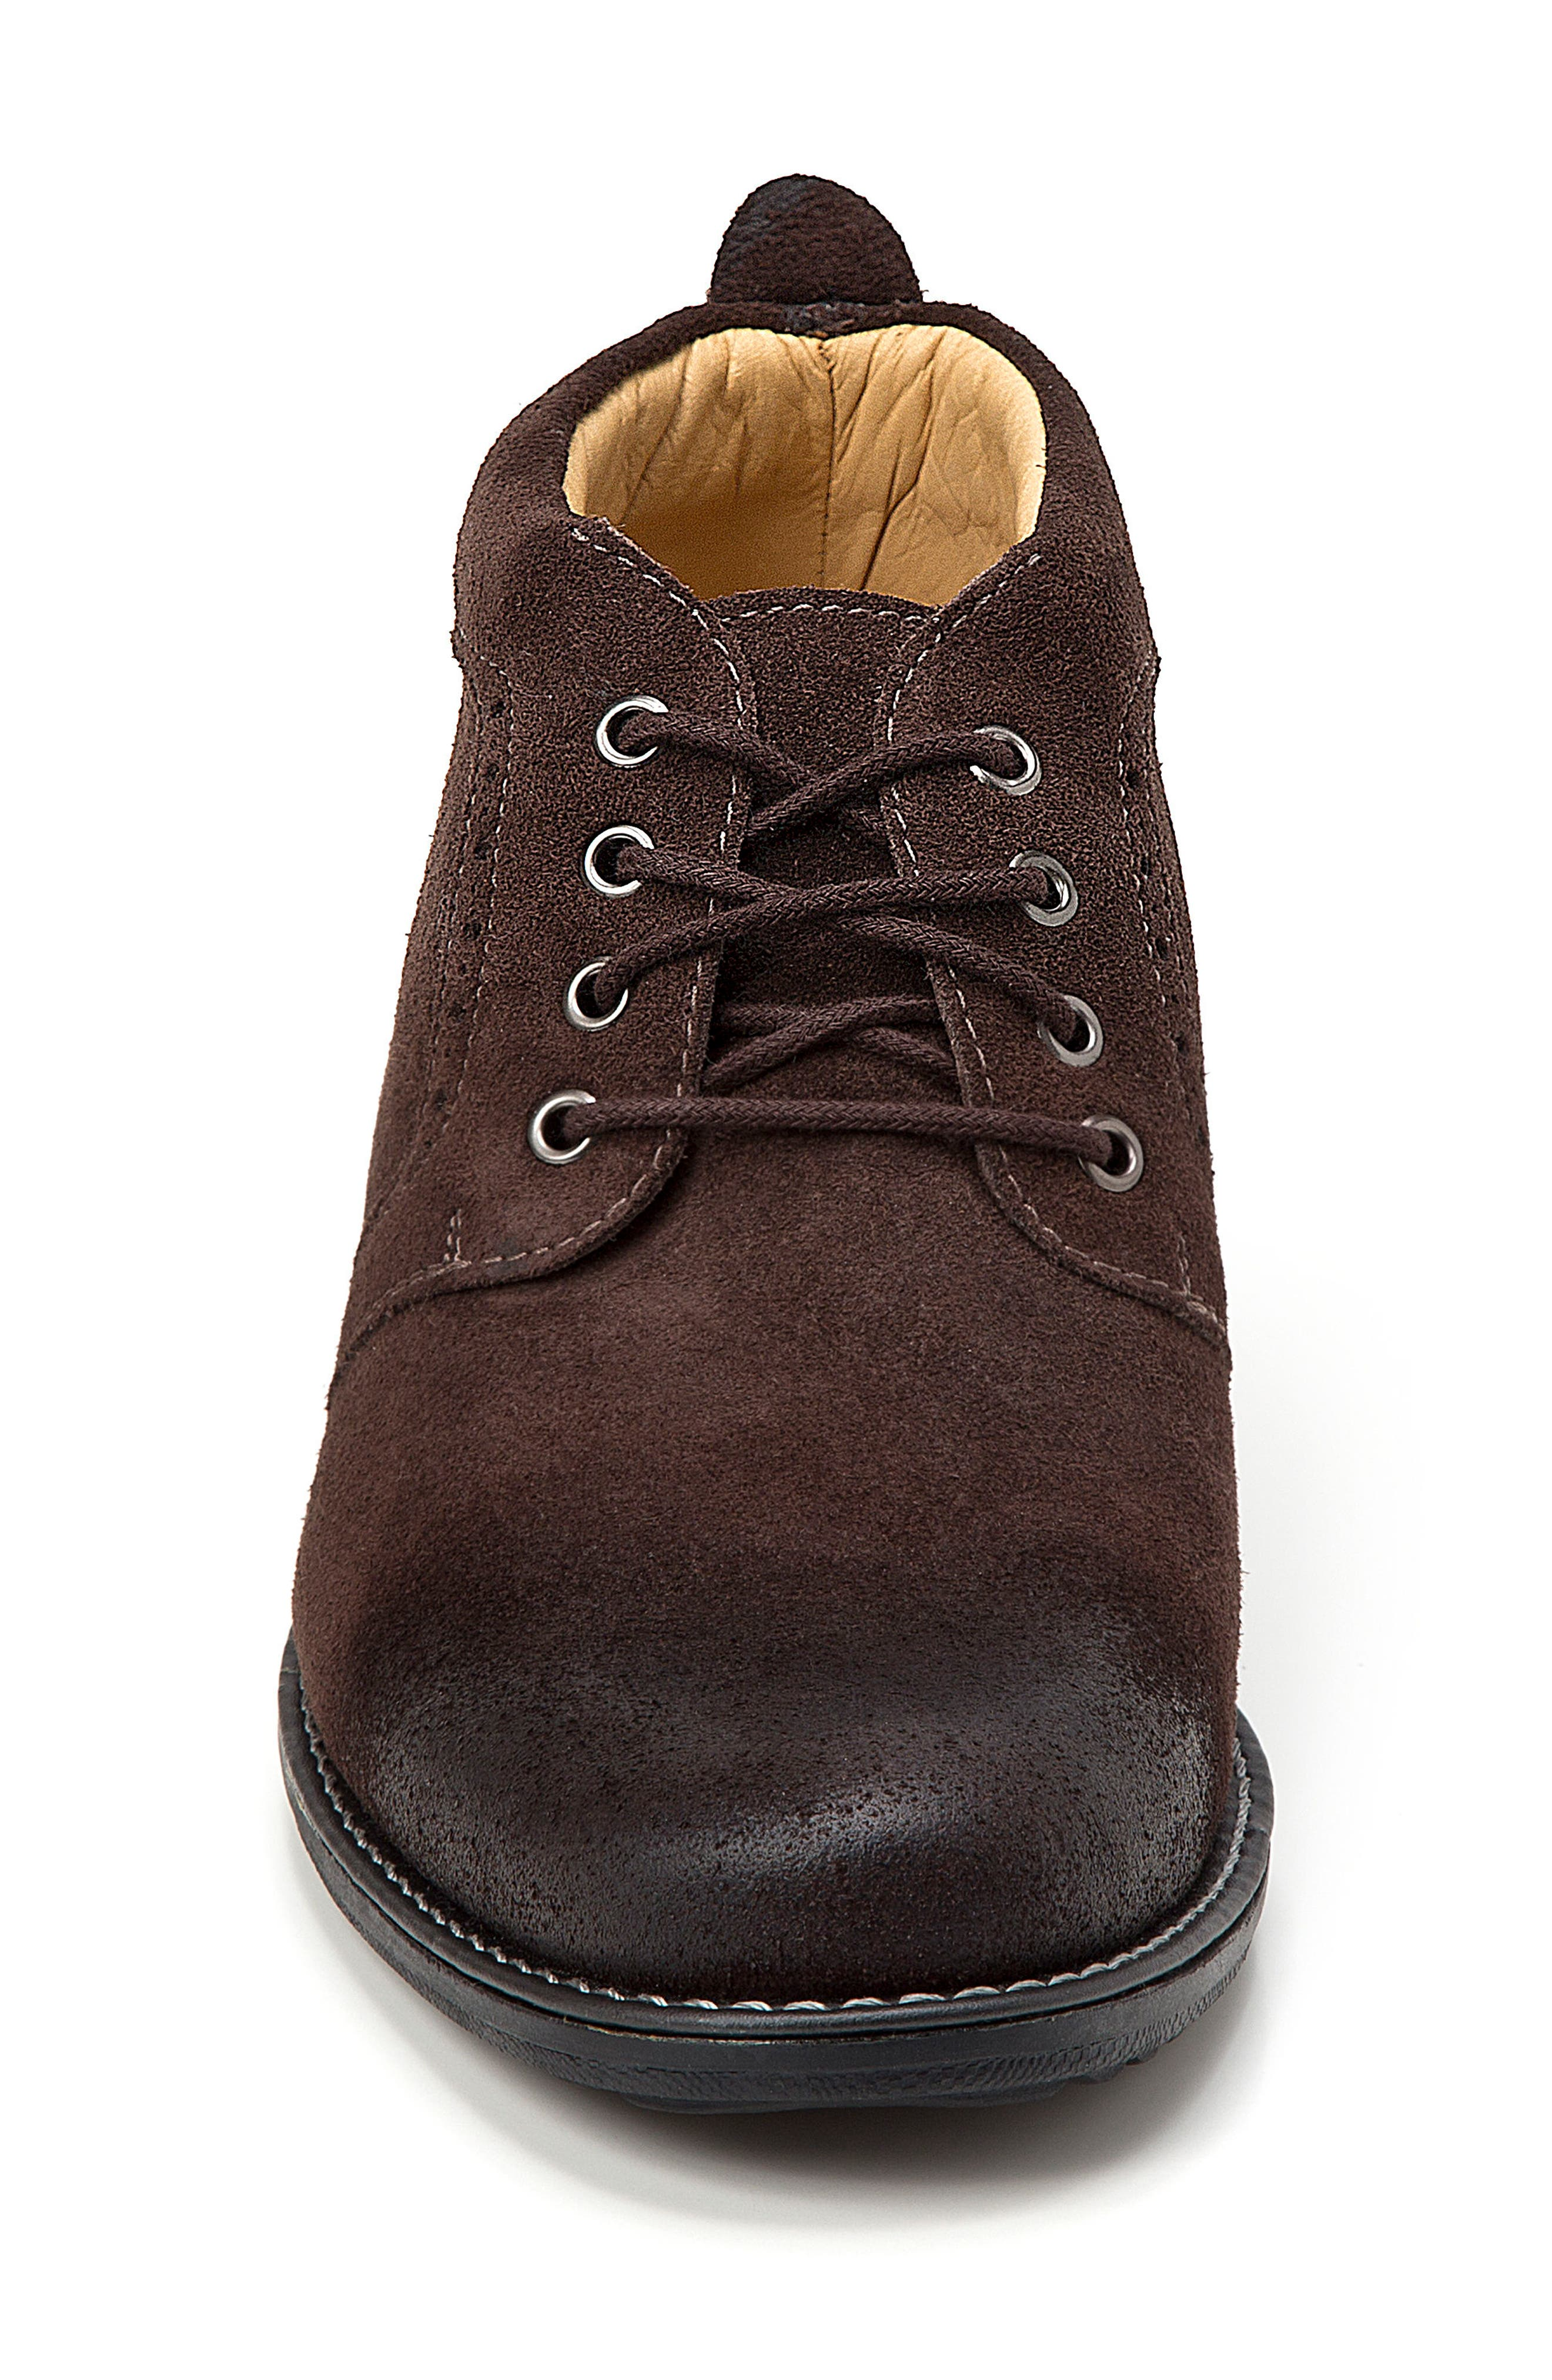 Chukka Boot,                             Alternate thumbnail 4, color,                             Brown